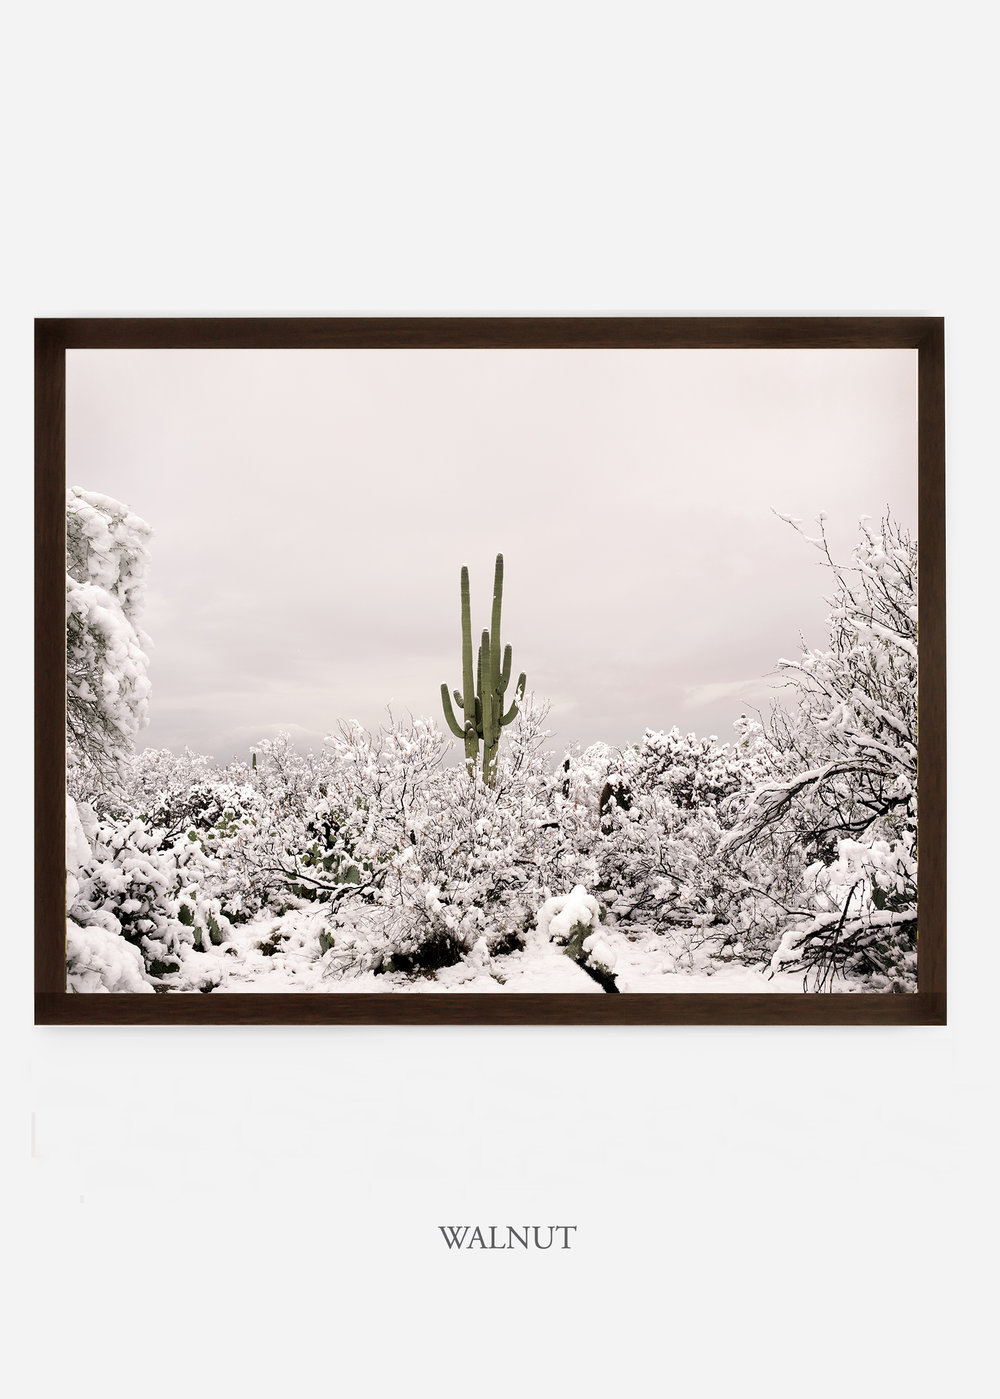 nomat_walnutframe-saguaroNo.1-wildercalifornia-art-wallart-cactusprint-homedecor-prints-arizona-botanical-artwork-interiordesign.jpg